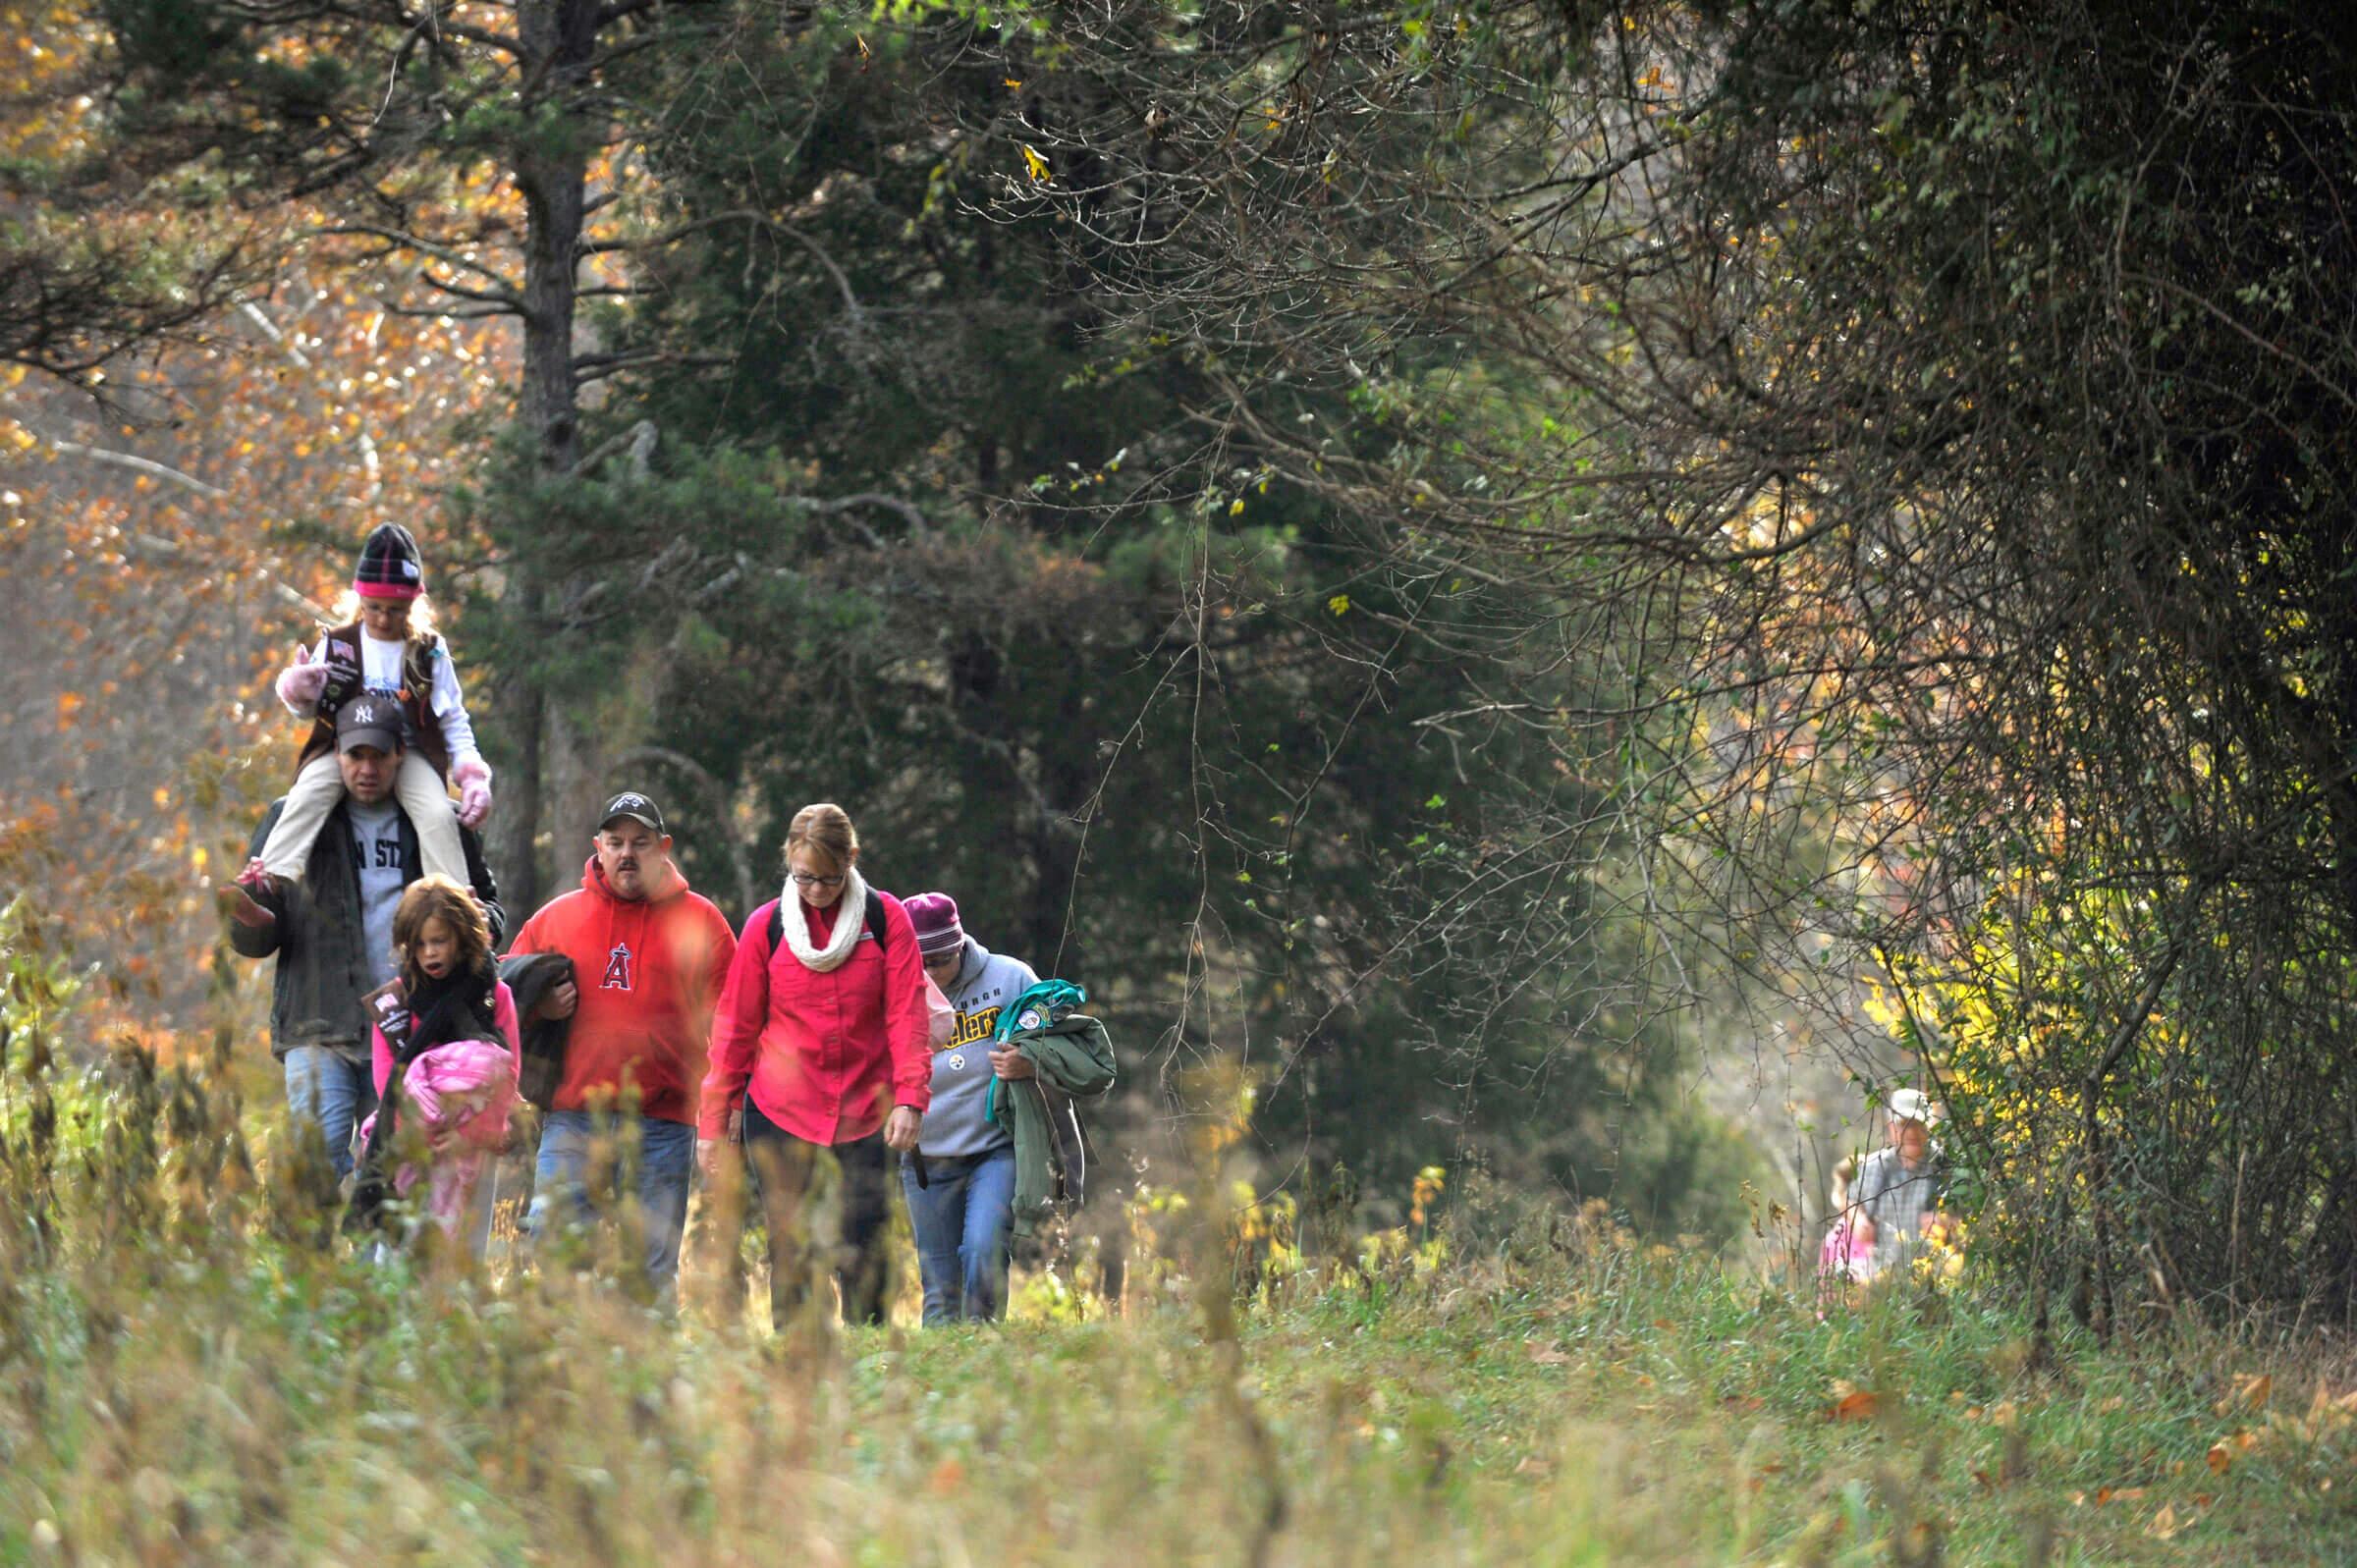 Photo: Girl Scouts, Hornets' Nest Council by Nancy Pierce